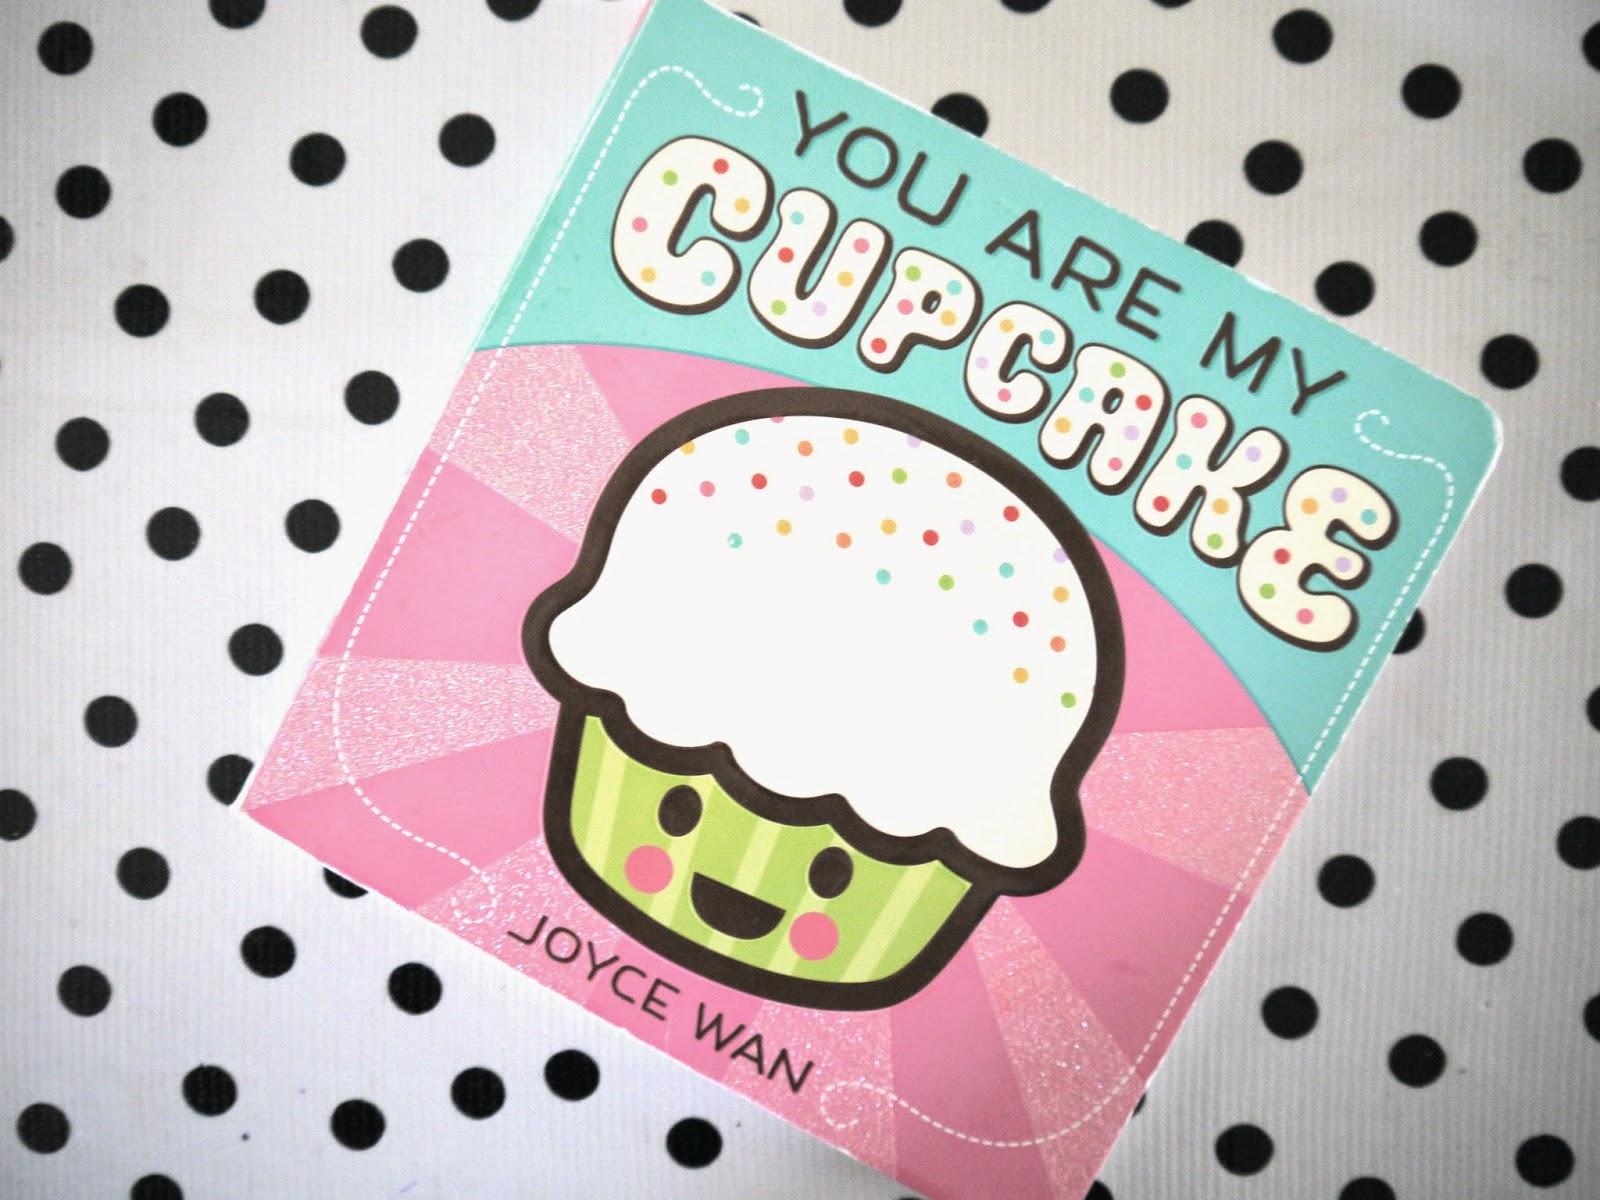 You are my cupcake, Joyce Wan